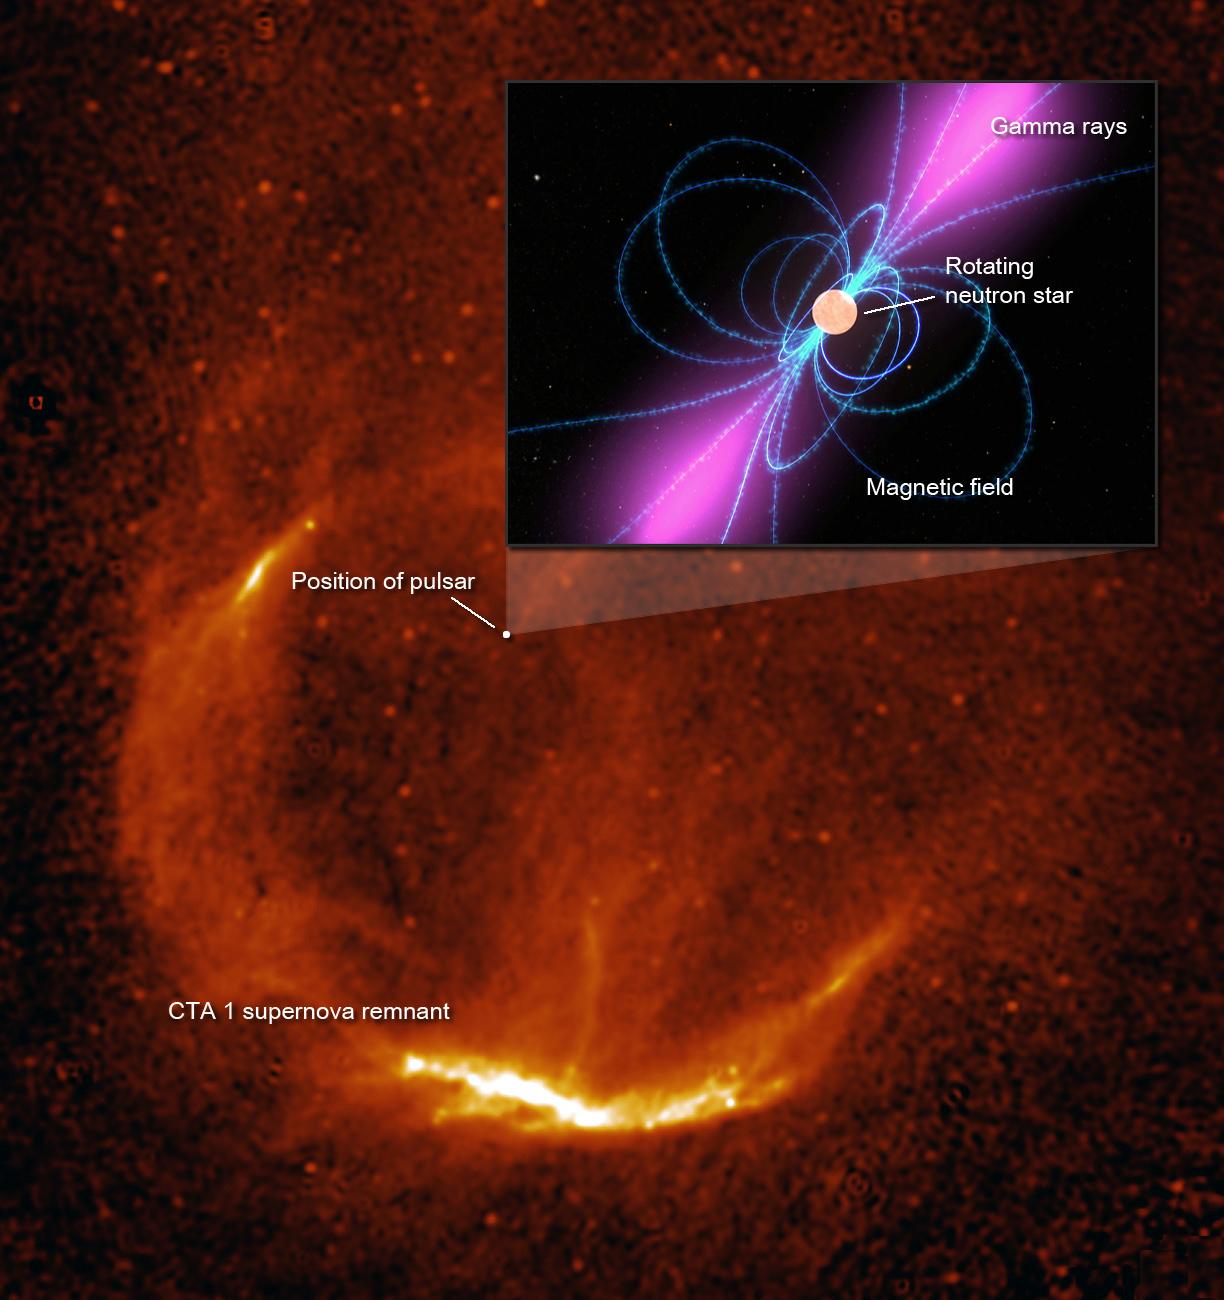 Fermi Telescope Discoveries Fermi Telescope Makes First